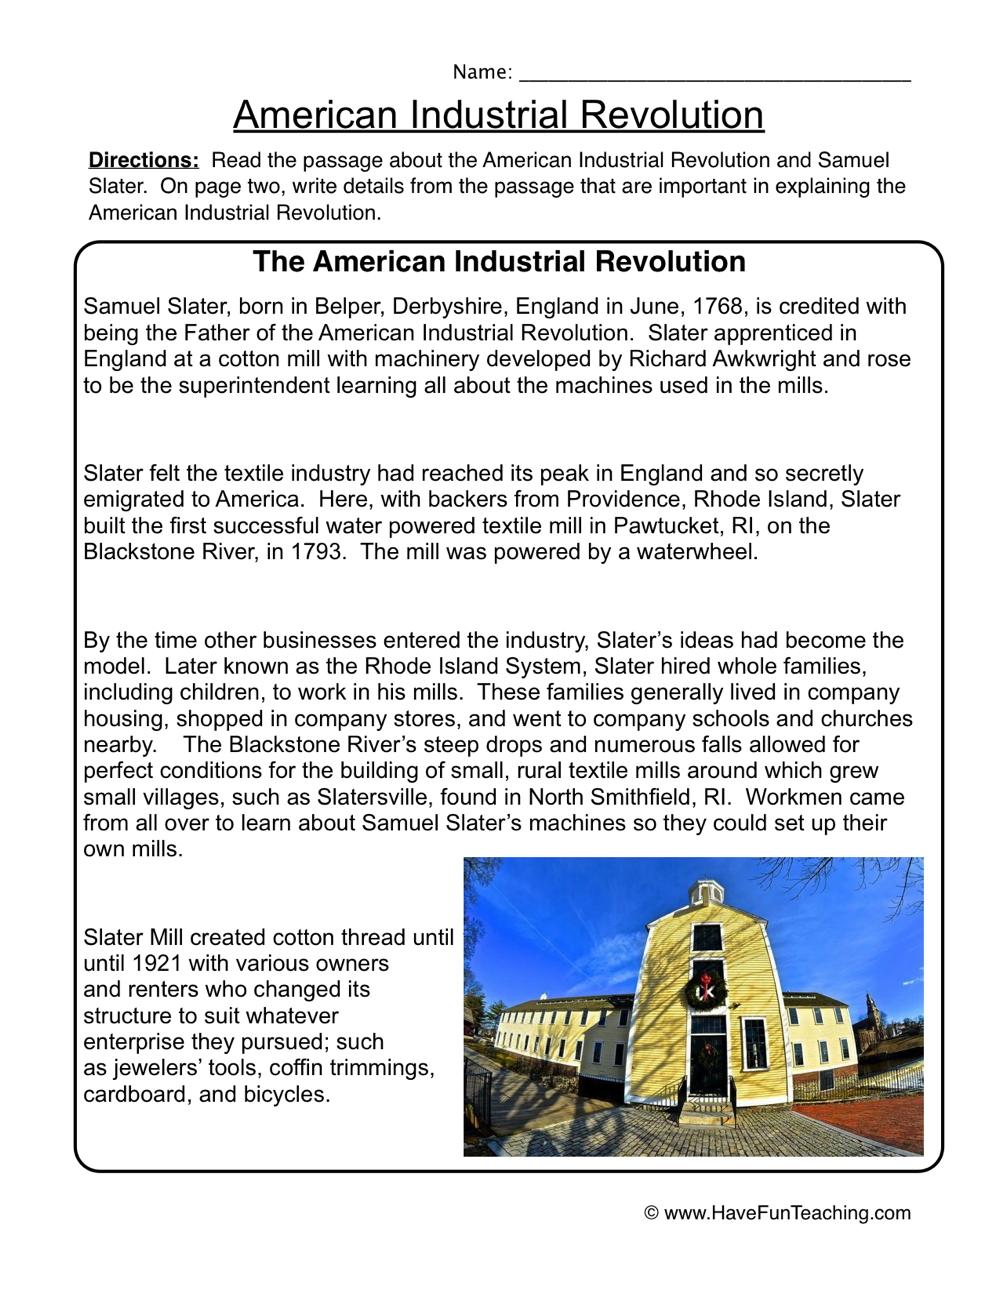 Fifth Grade Social Studies History Worksheets Resources